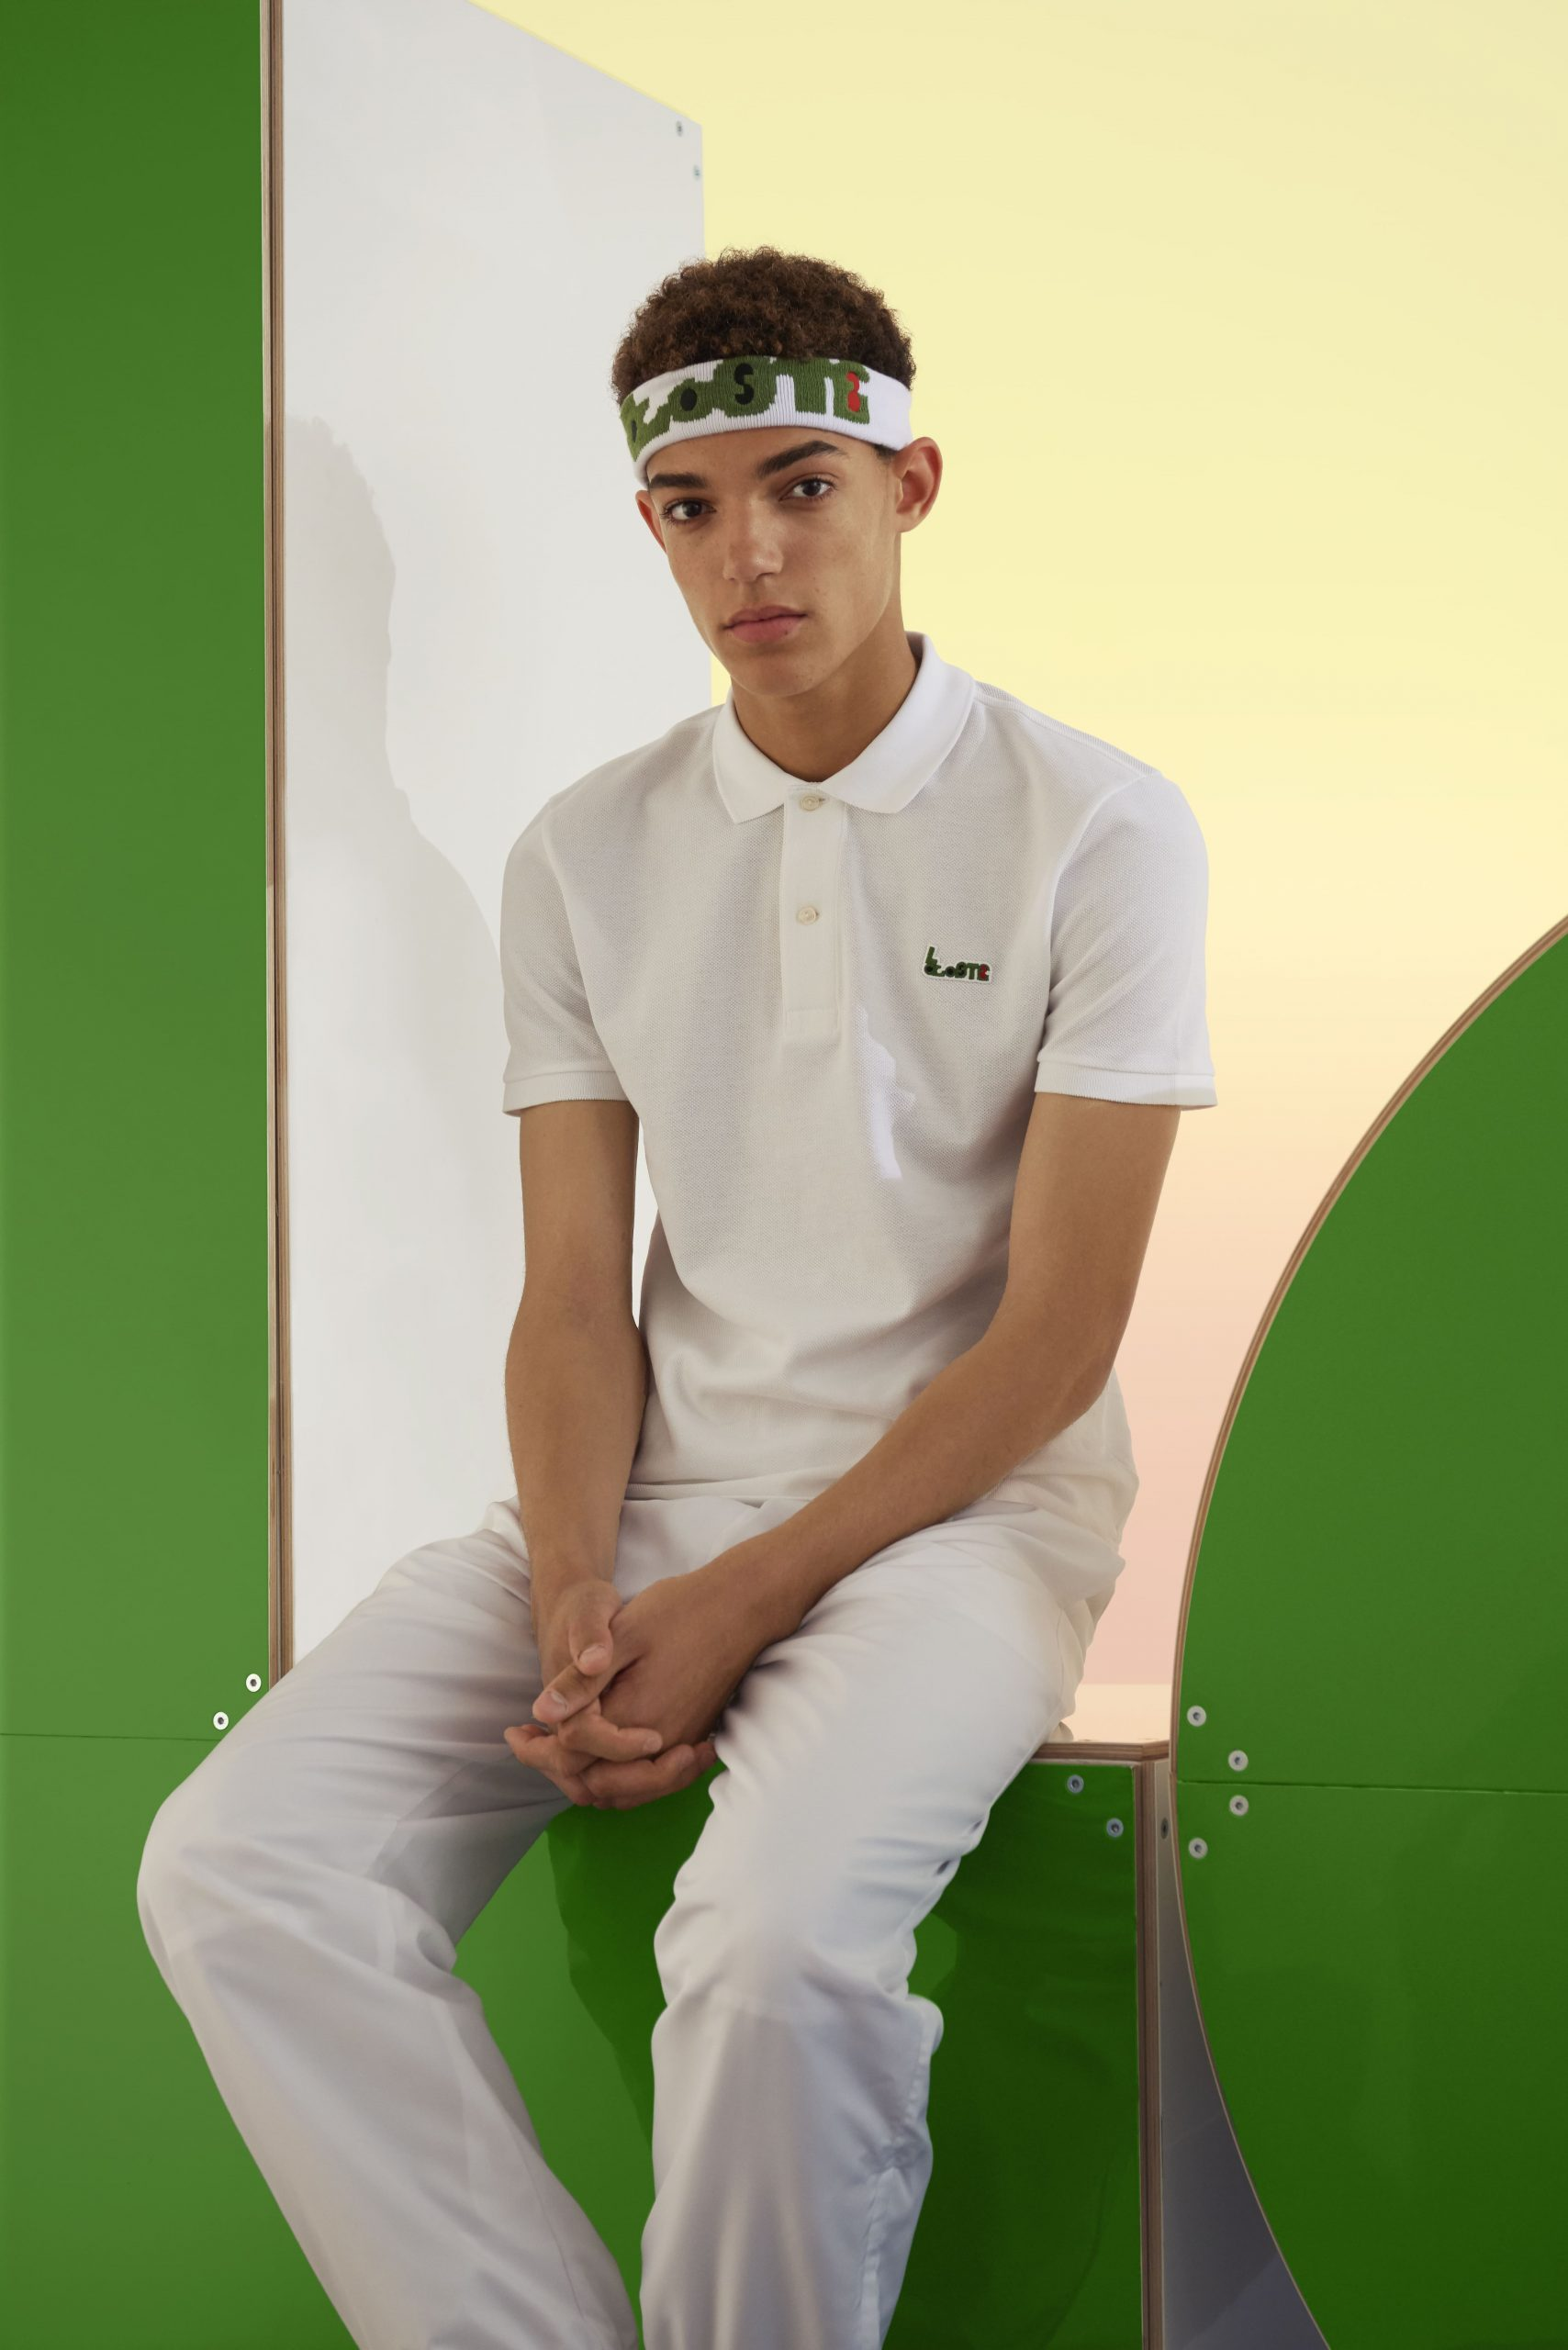 d20c2951e21 Lacoste X MM (Paris) FW17 Vanity Teen Menswear Magazine (13 ...